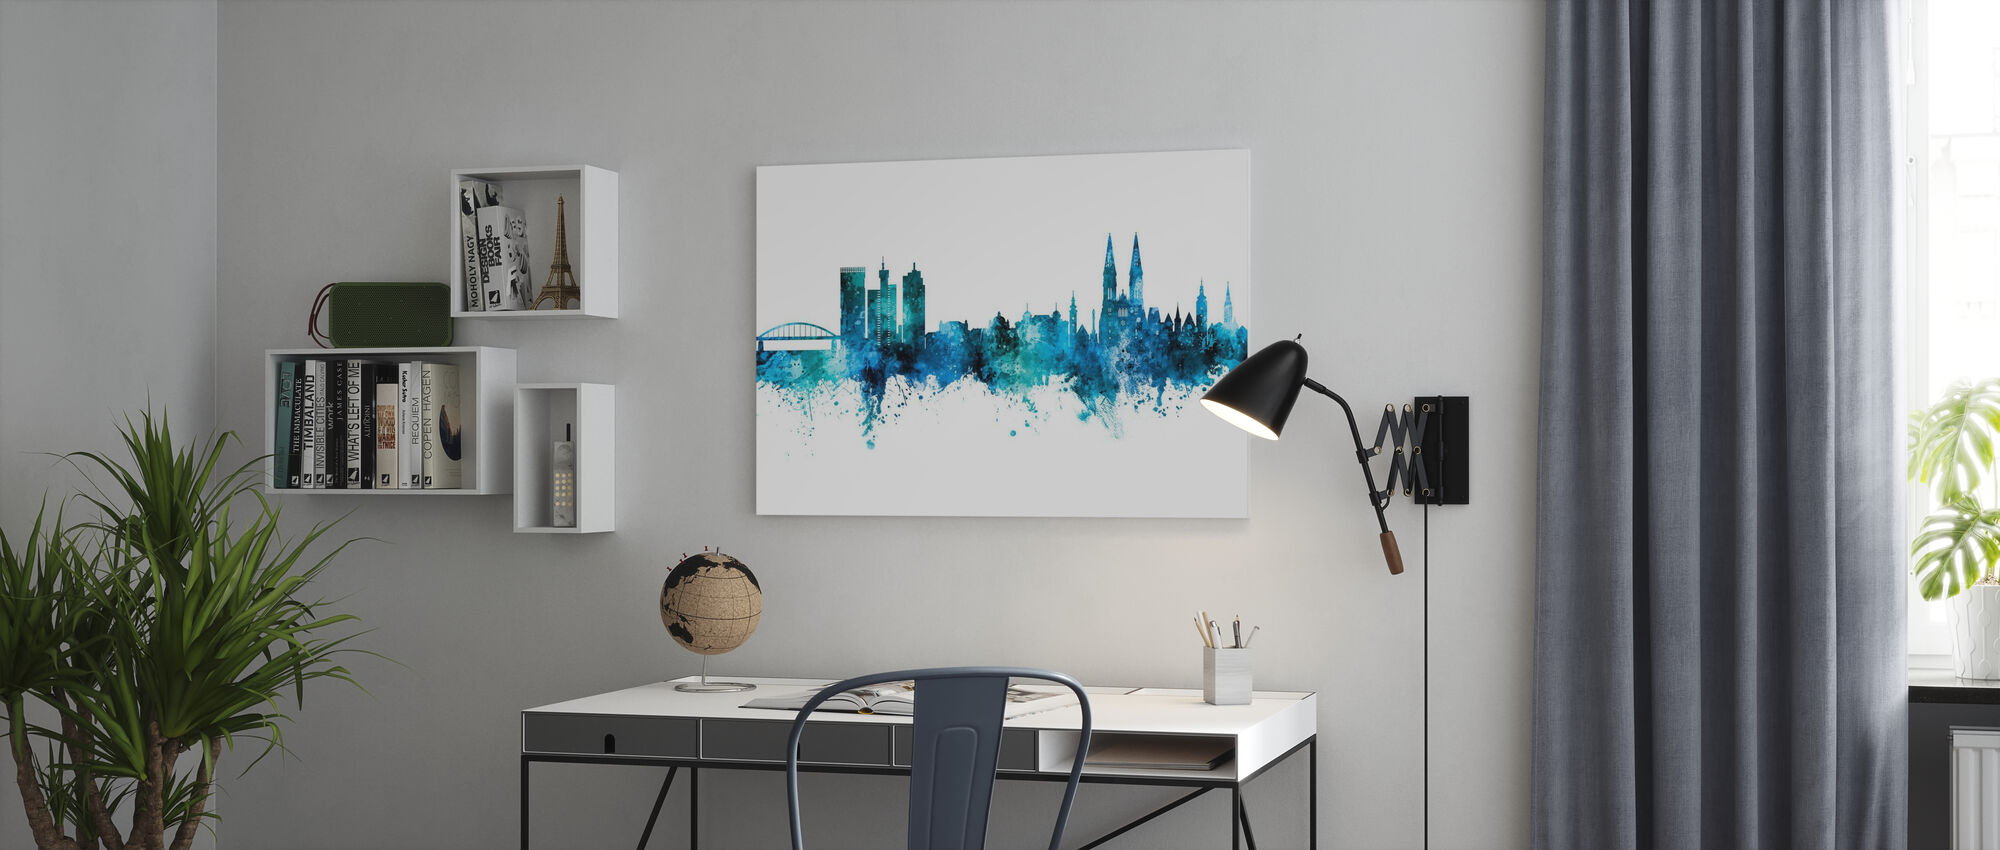 Zagreb Croatia Skyline - Canvas print - Office